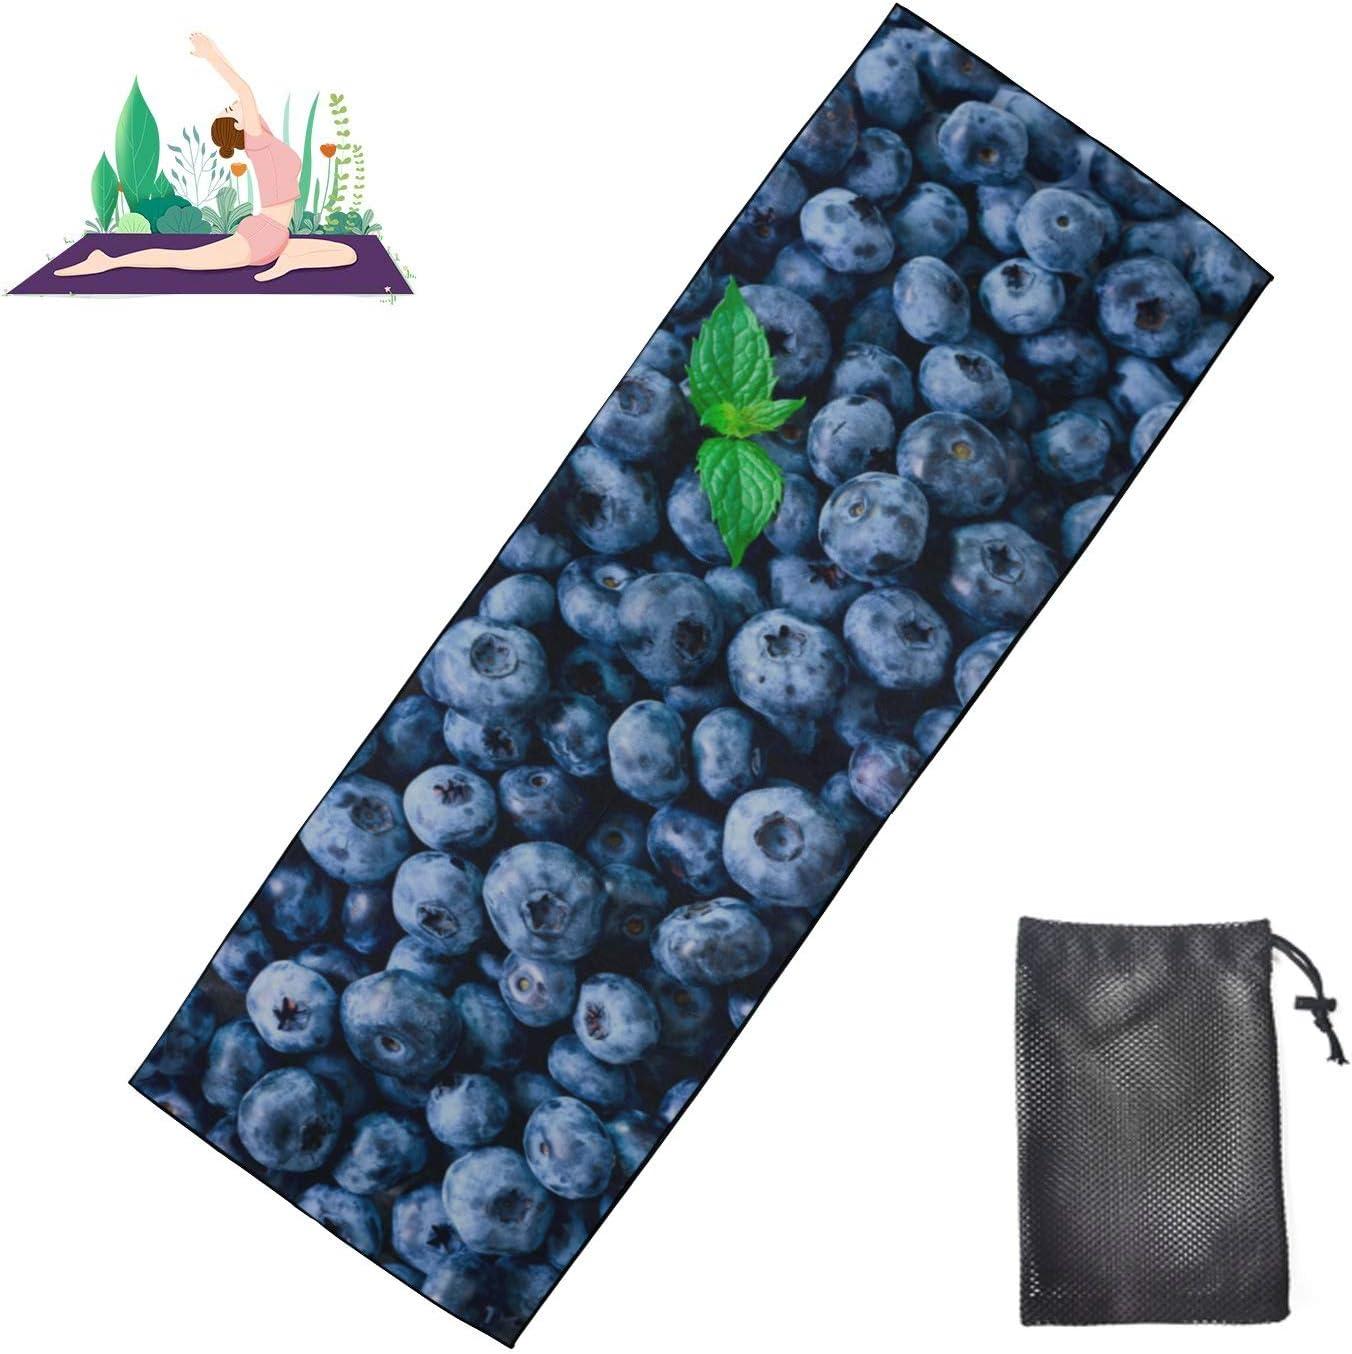 Jnseff Girl List price Yoga Mat Health Max 86% OFF Blueberries Towel Yog Protective